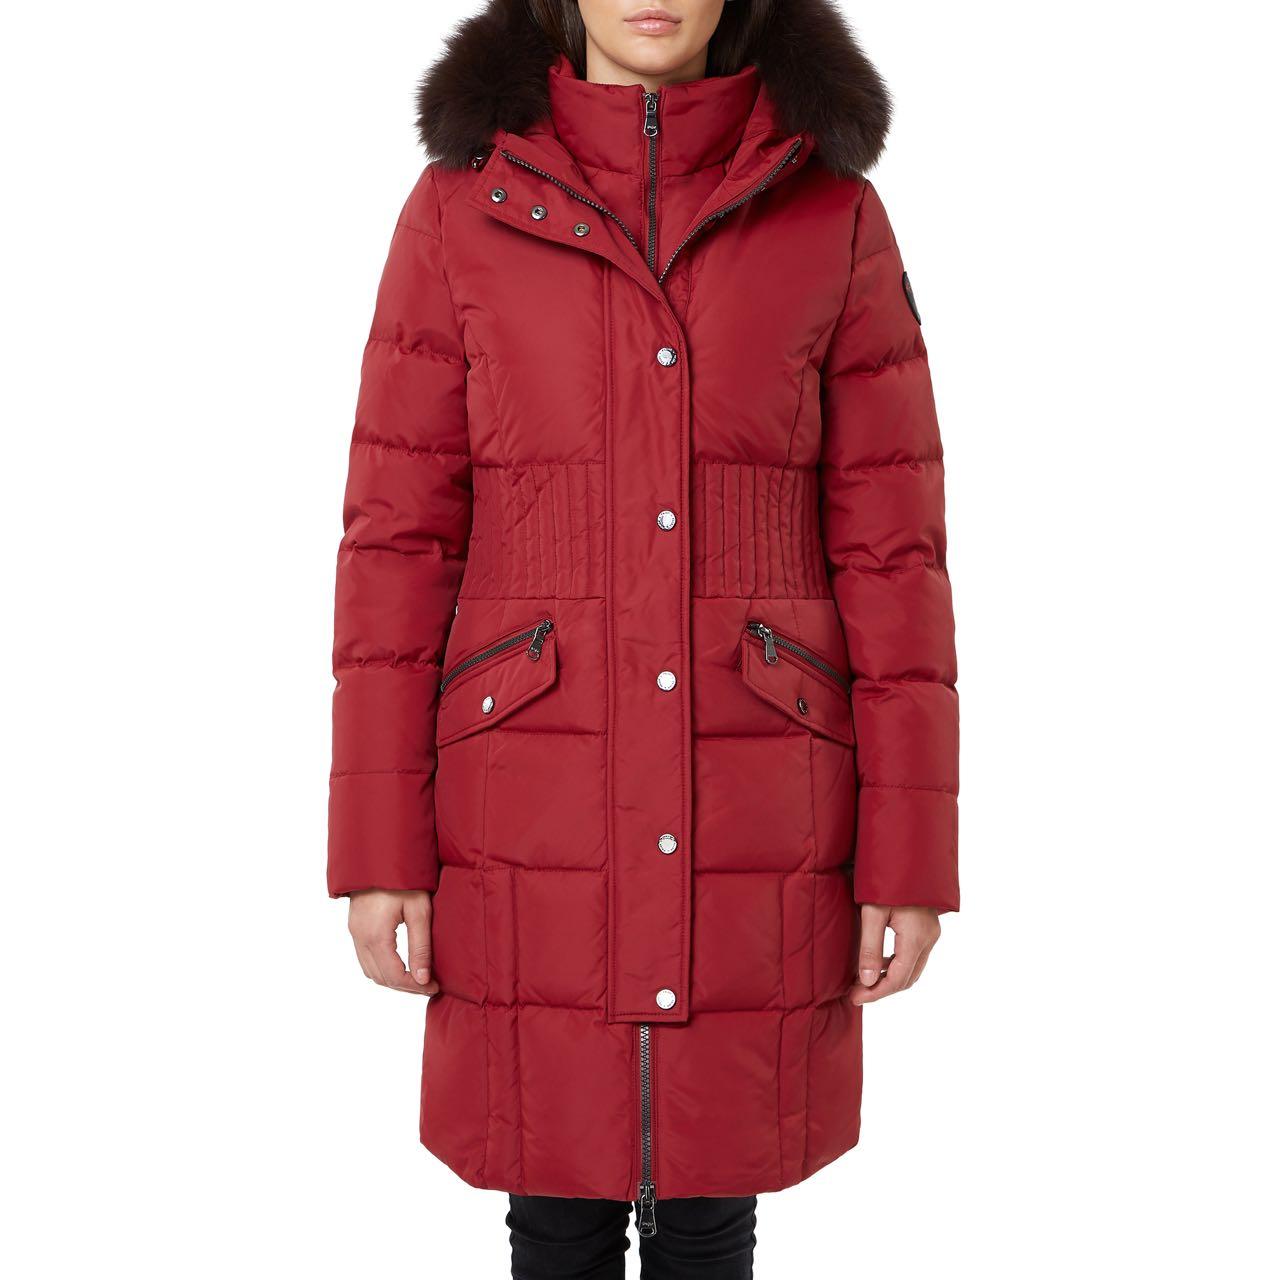 Pajar Winter Down Long Coat Parka ANNIE RED Canada USA